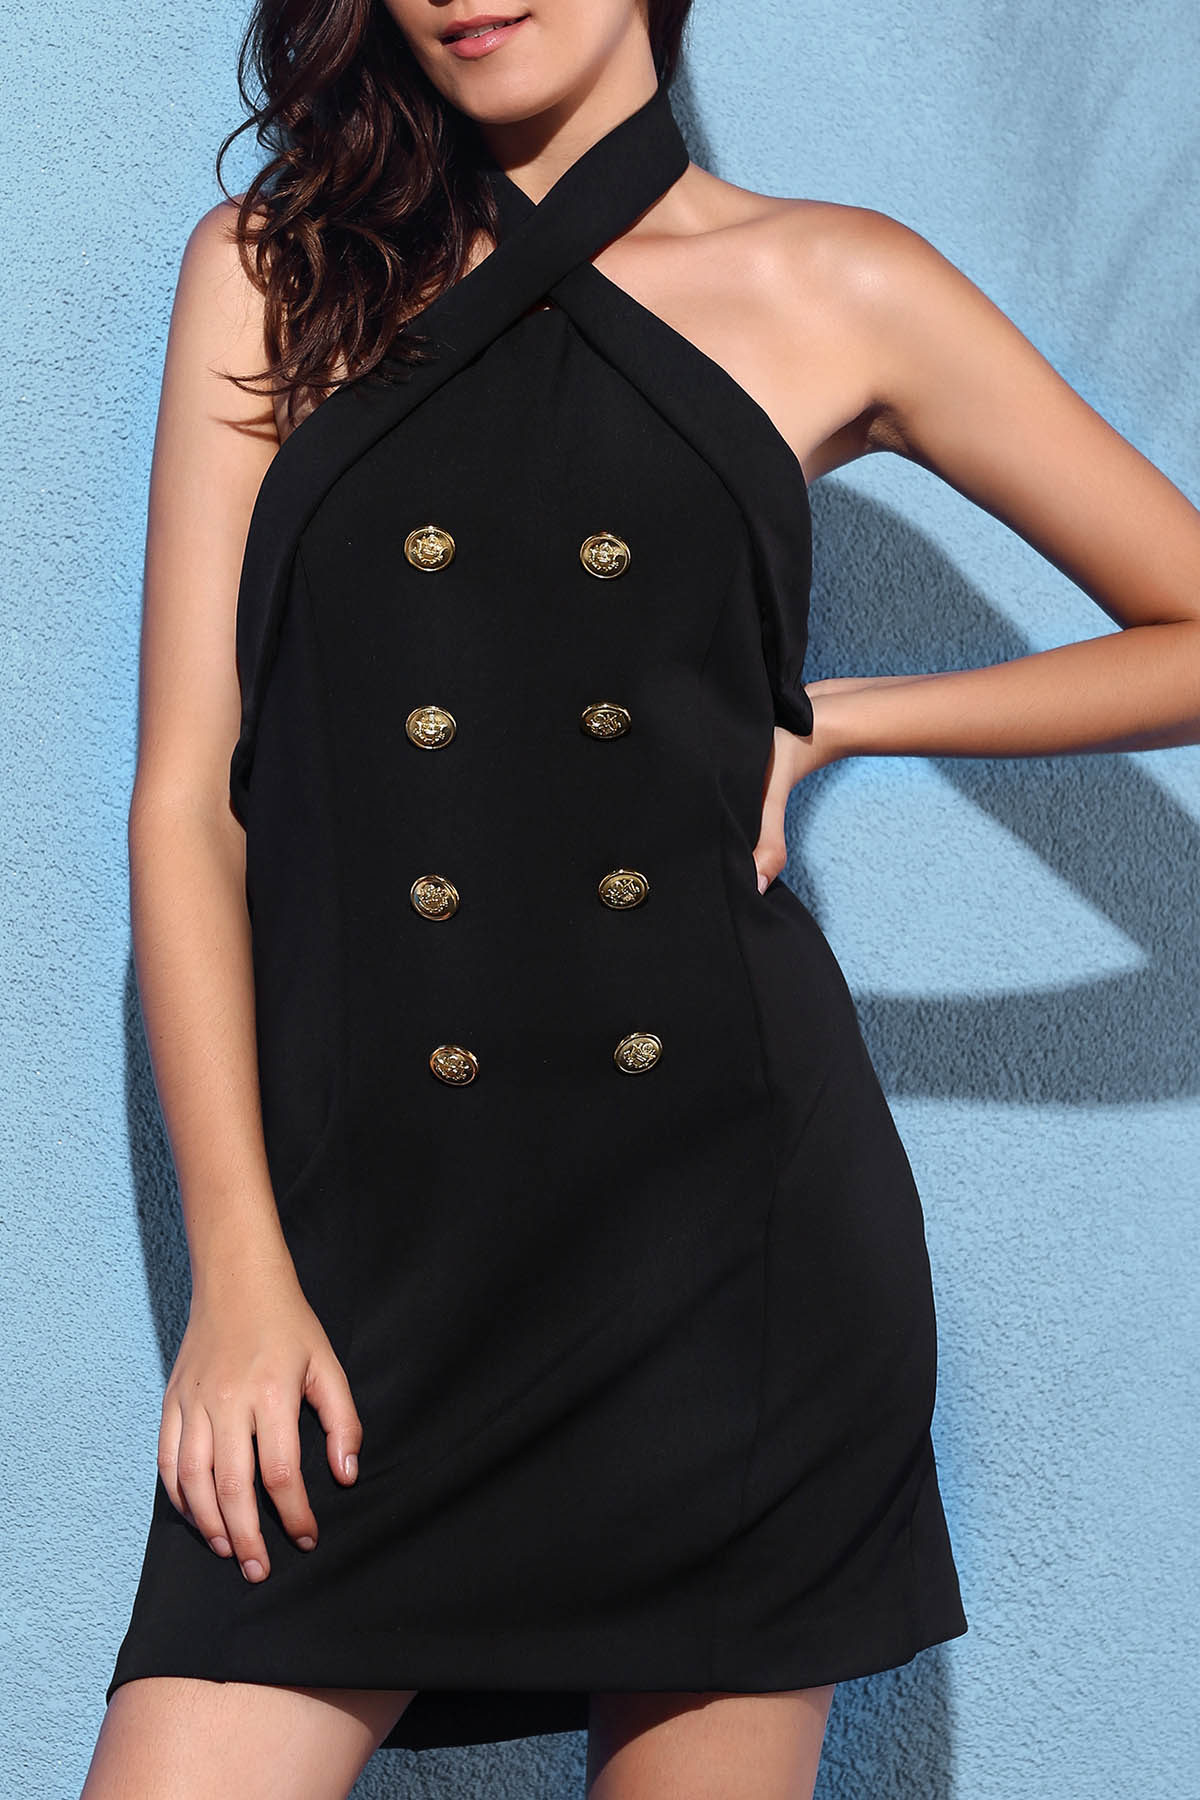 Cross Halter Sleeveless Backless Solid Color Dress